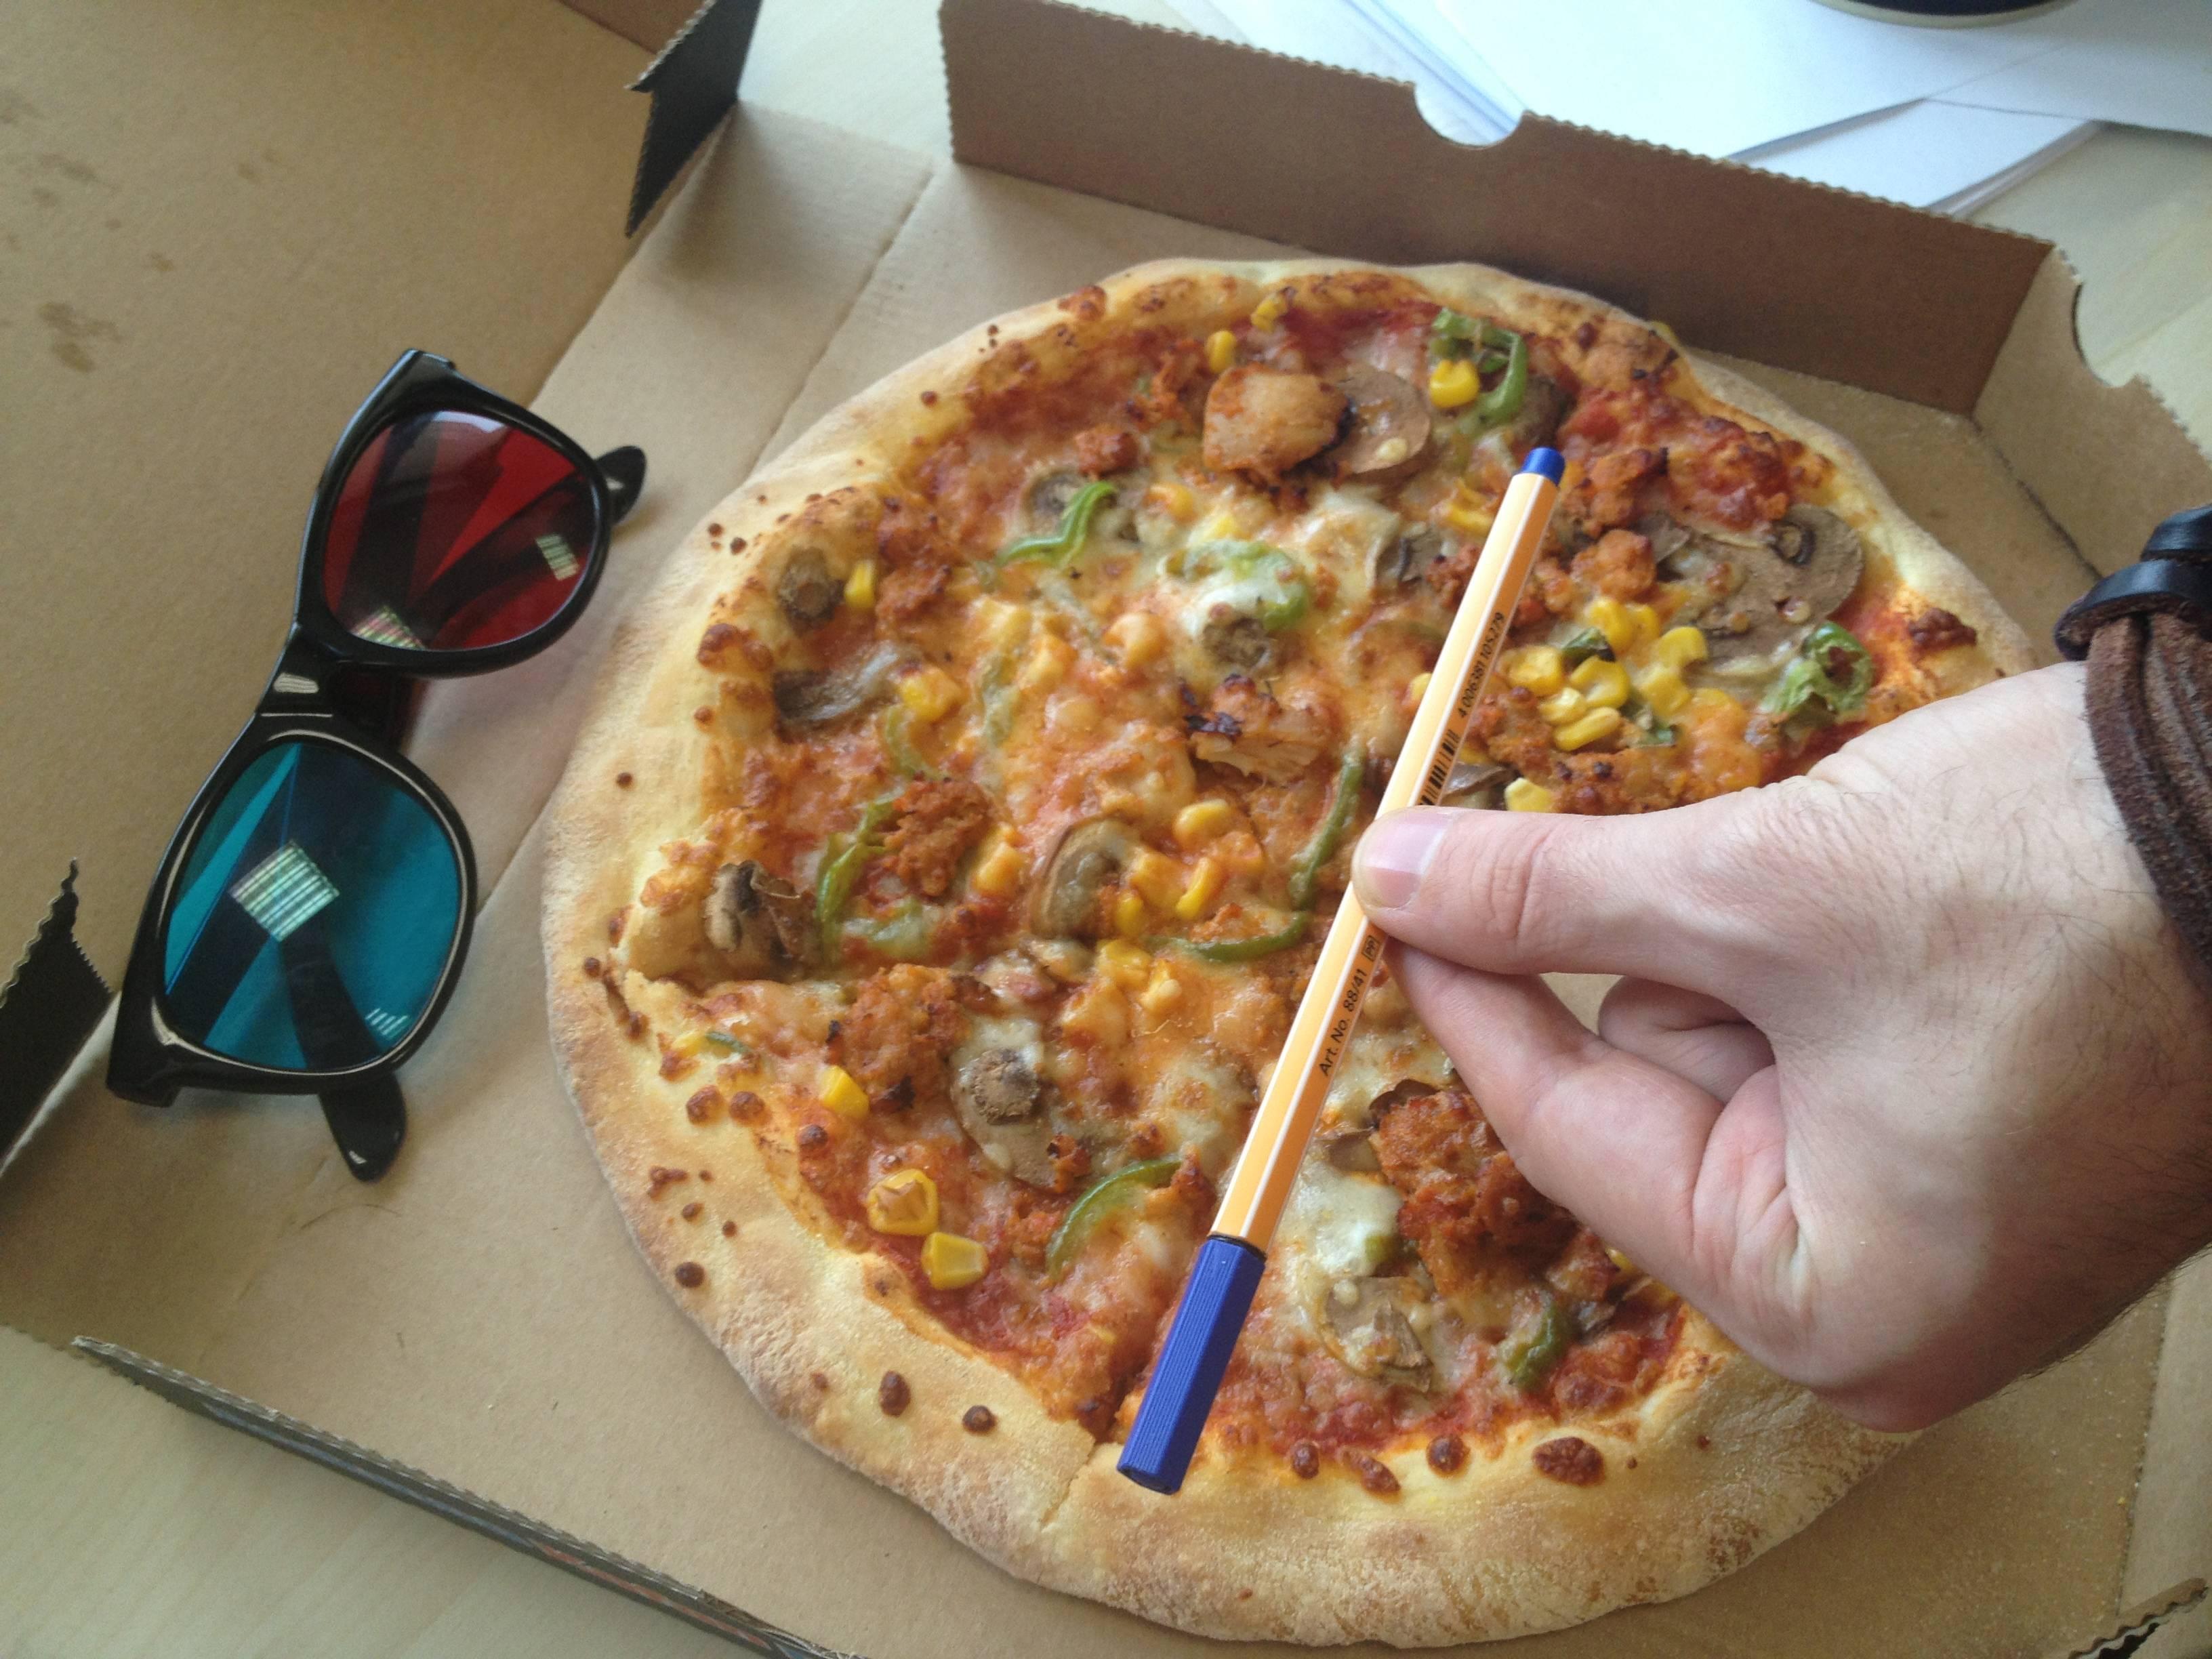 resimli tarif: dominos küçük boy pizza kaç dilim [18]